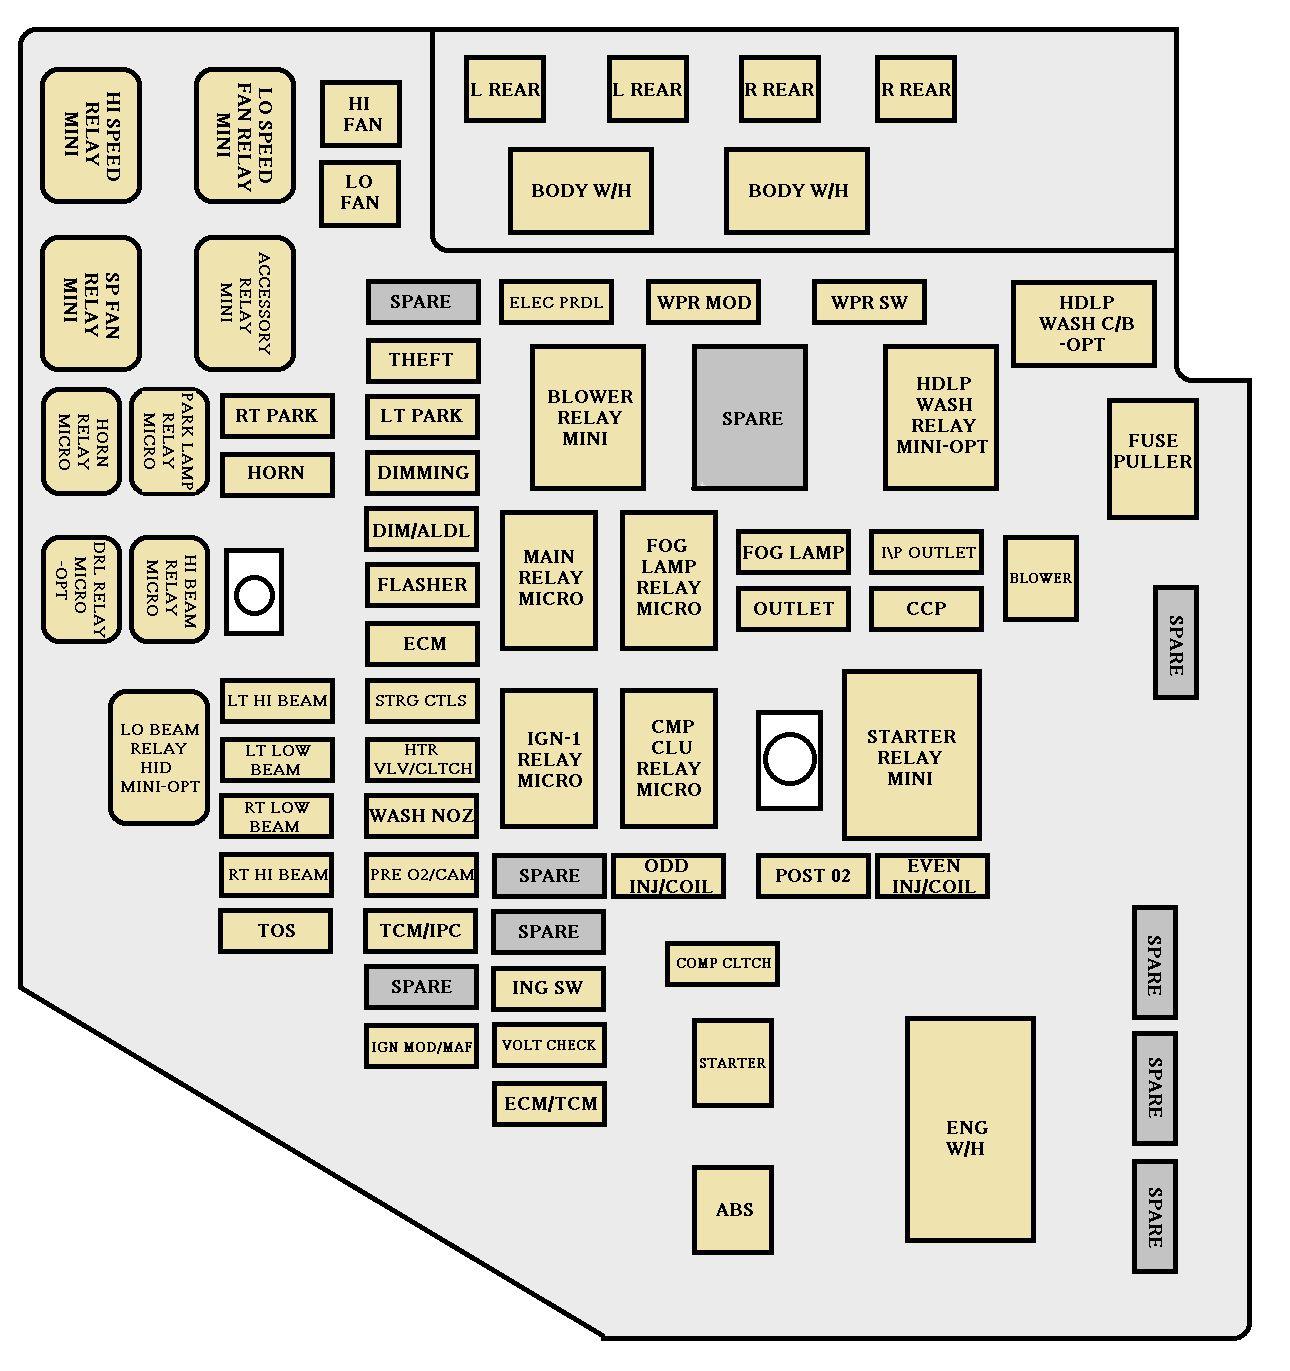 [SCHEMATICS_4US]  XD_4355] 2005 Cadillac Deville Seat Wiring Diagram Download Diagram | 2005 Deville Fuse Box Diagram |  | Bios Numap Mohammedshrine Librar Wiring 101